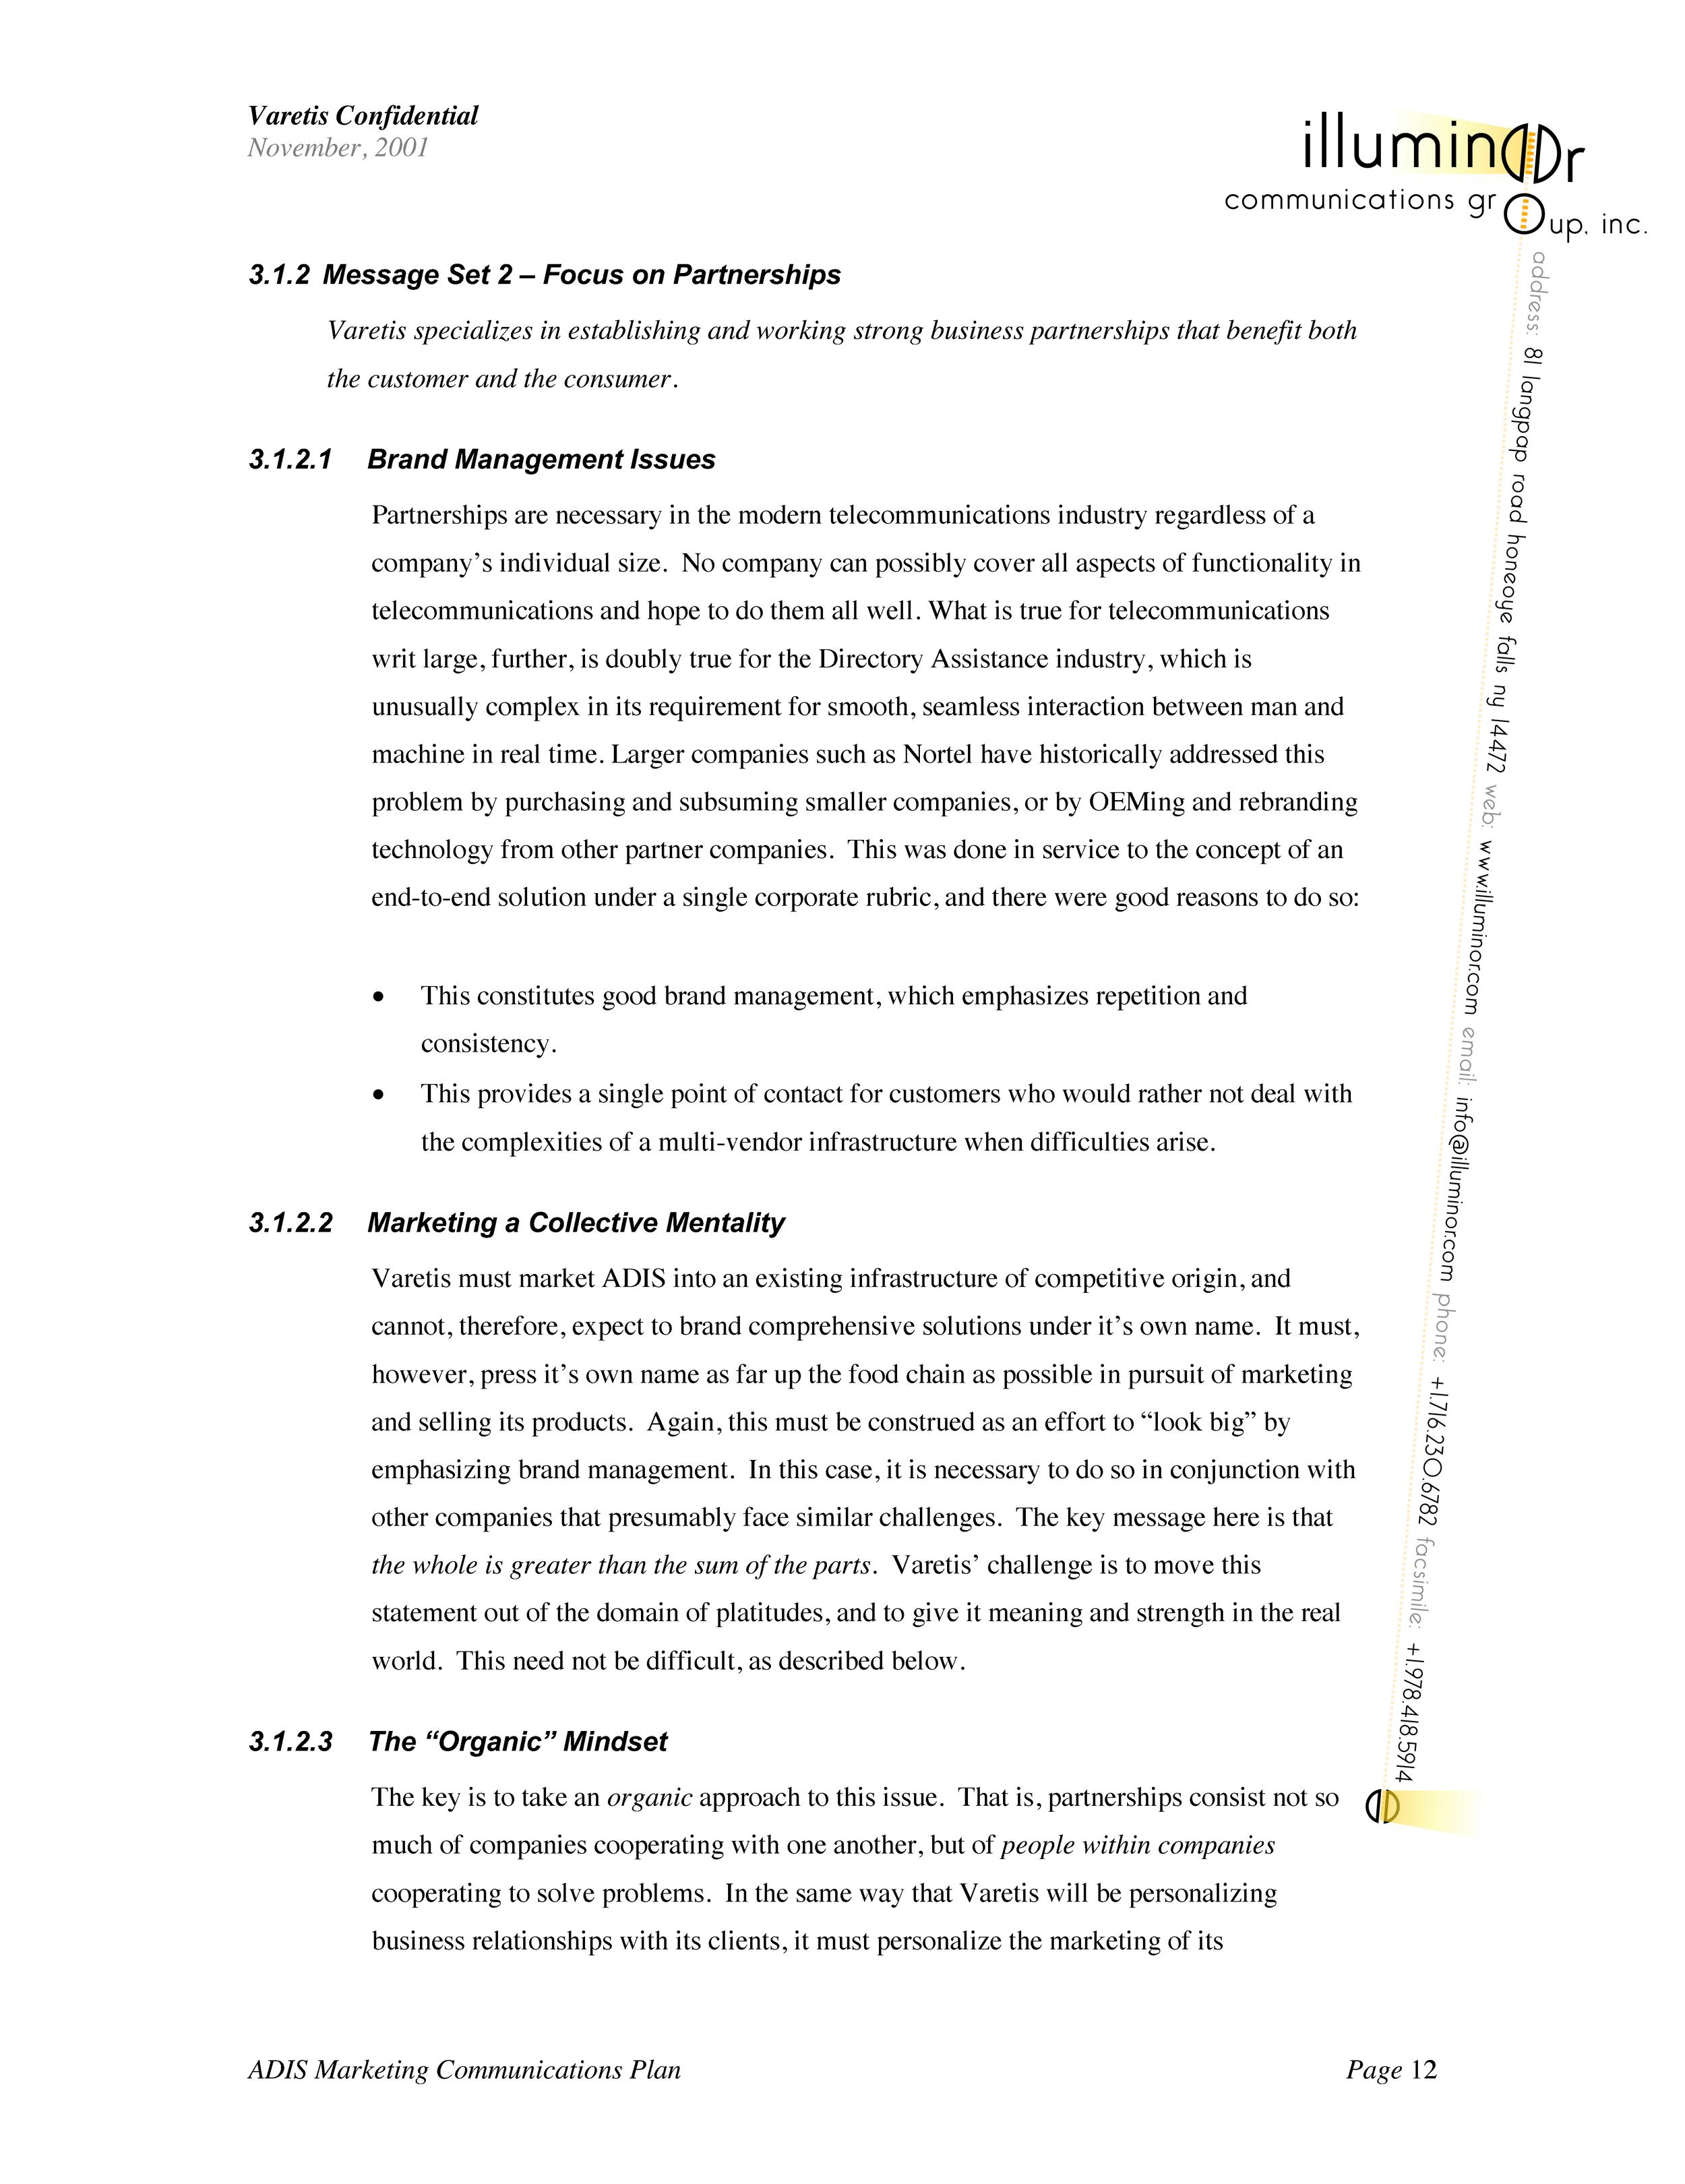 ADIS Marcomm Plan_Page_12.png